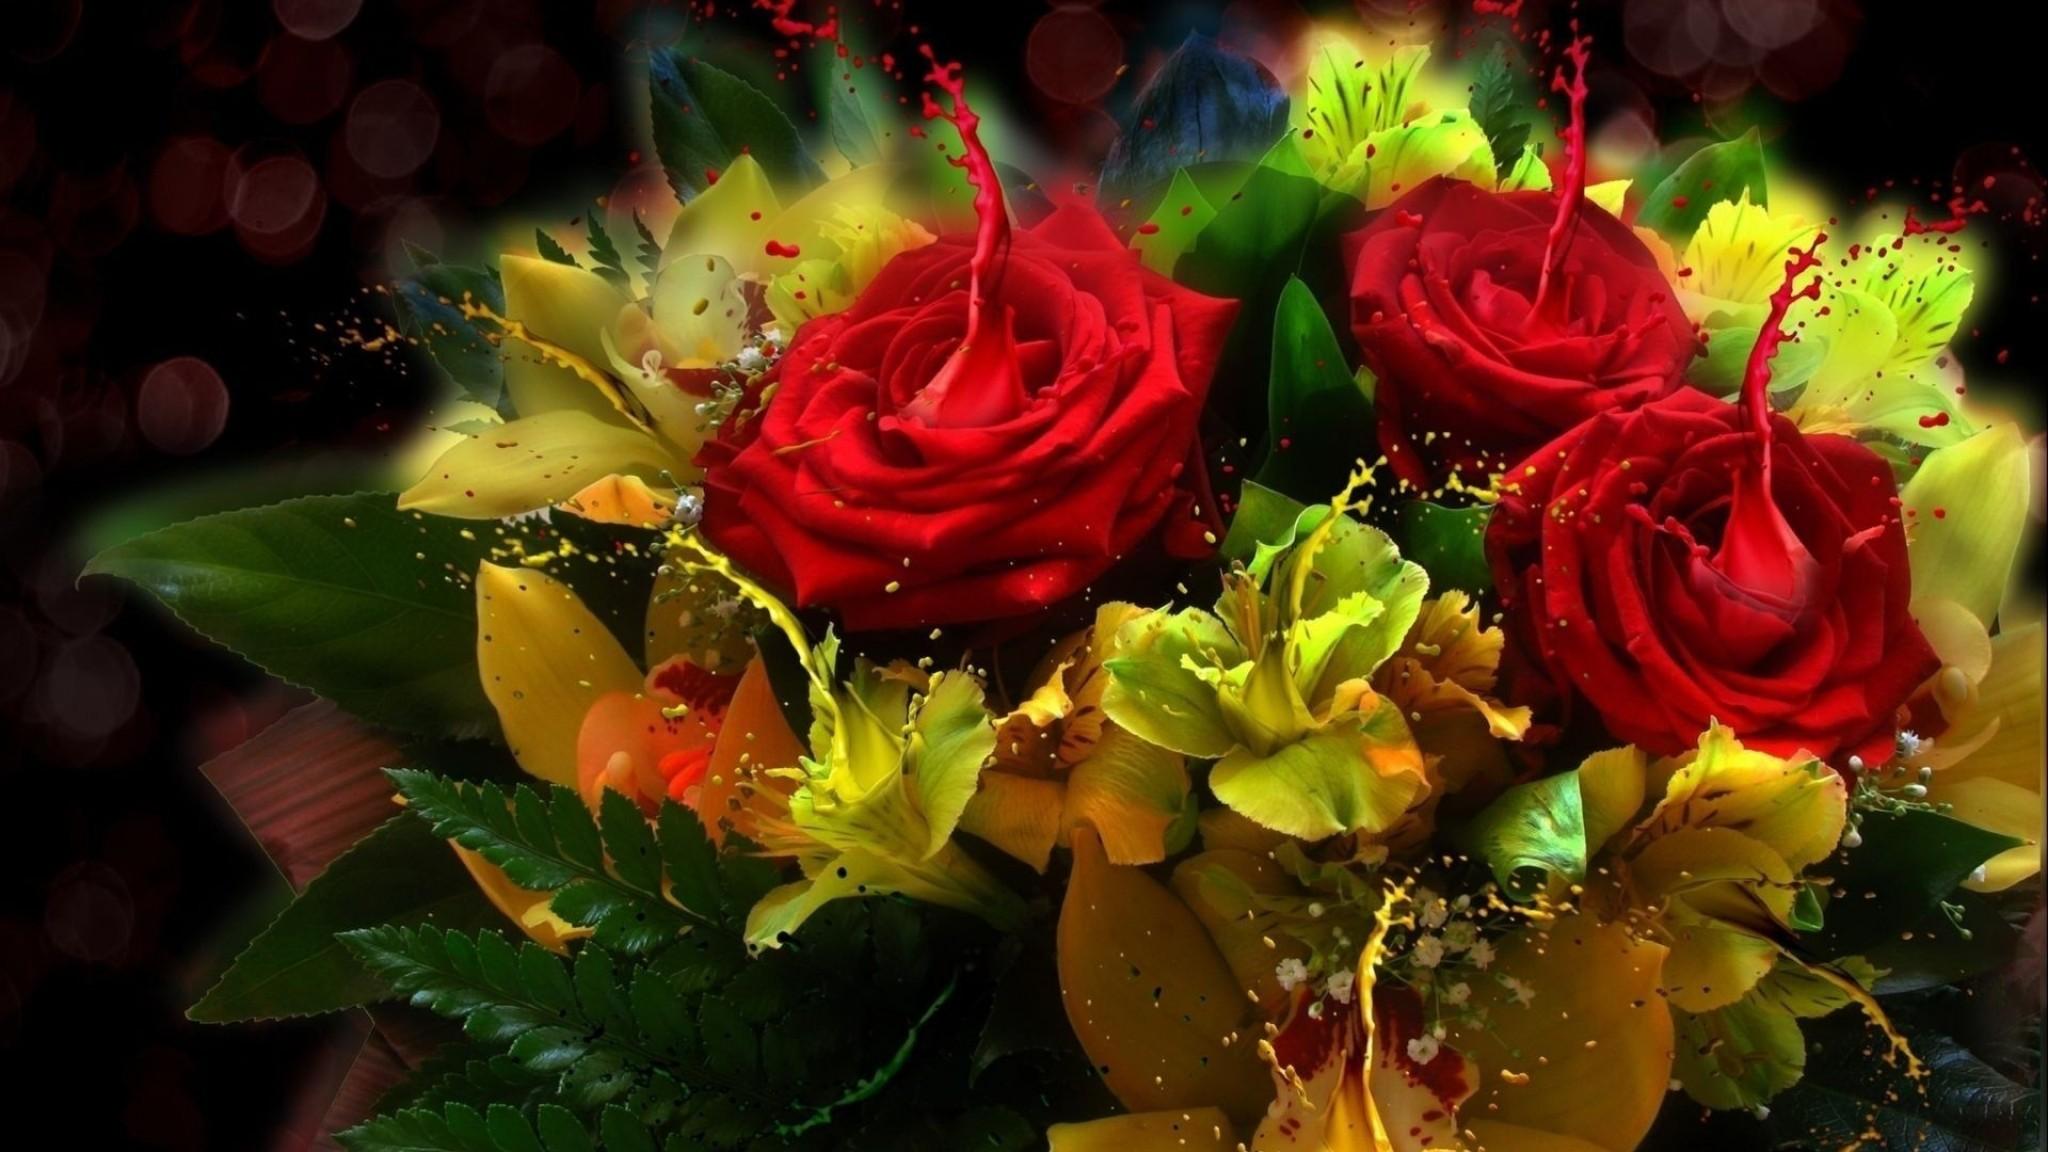 Bouquet  orchid  flowers  rose HD Wallpaper